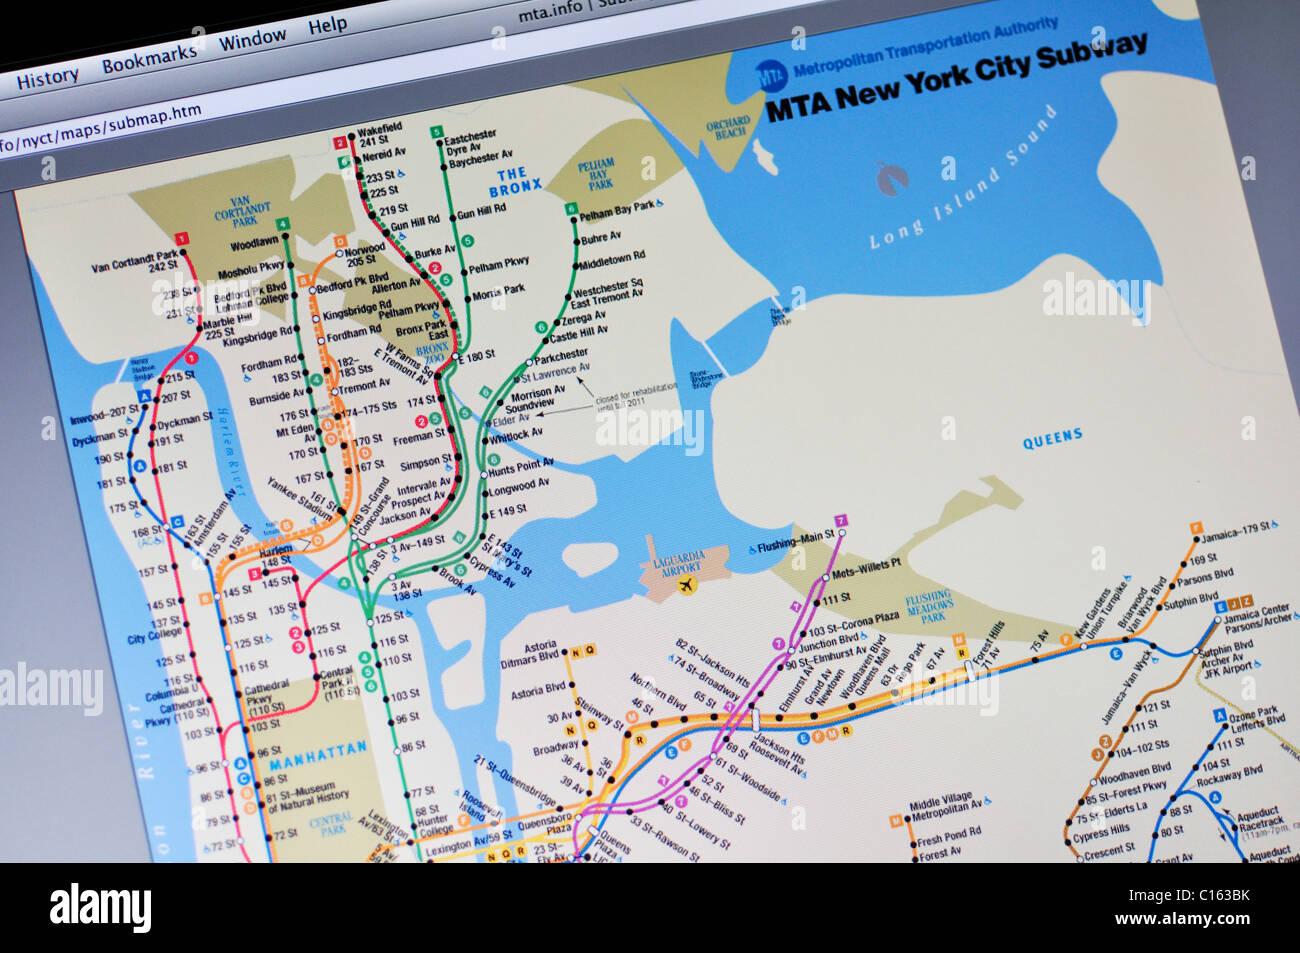 New York Subway Map Stockfotos & New York Subway Map Bilder - Alamy